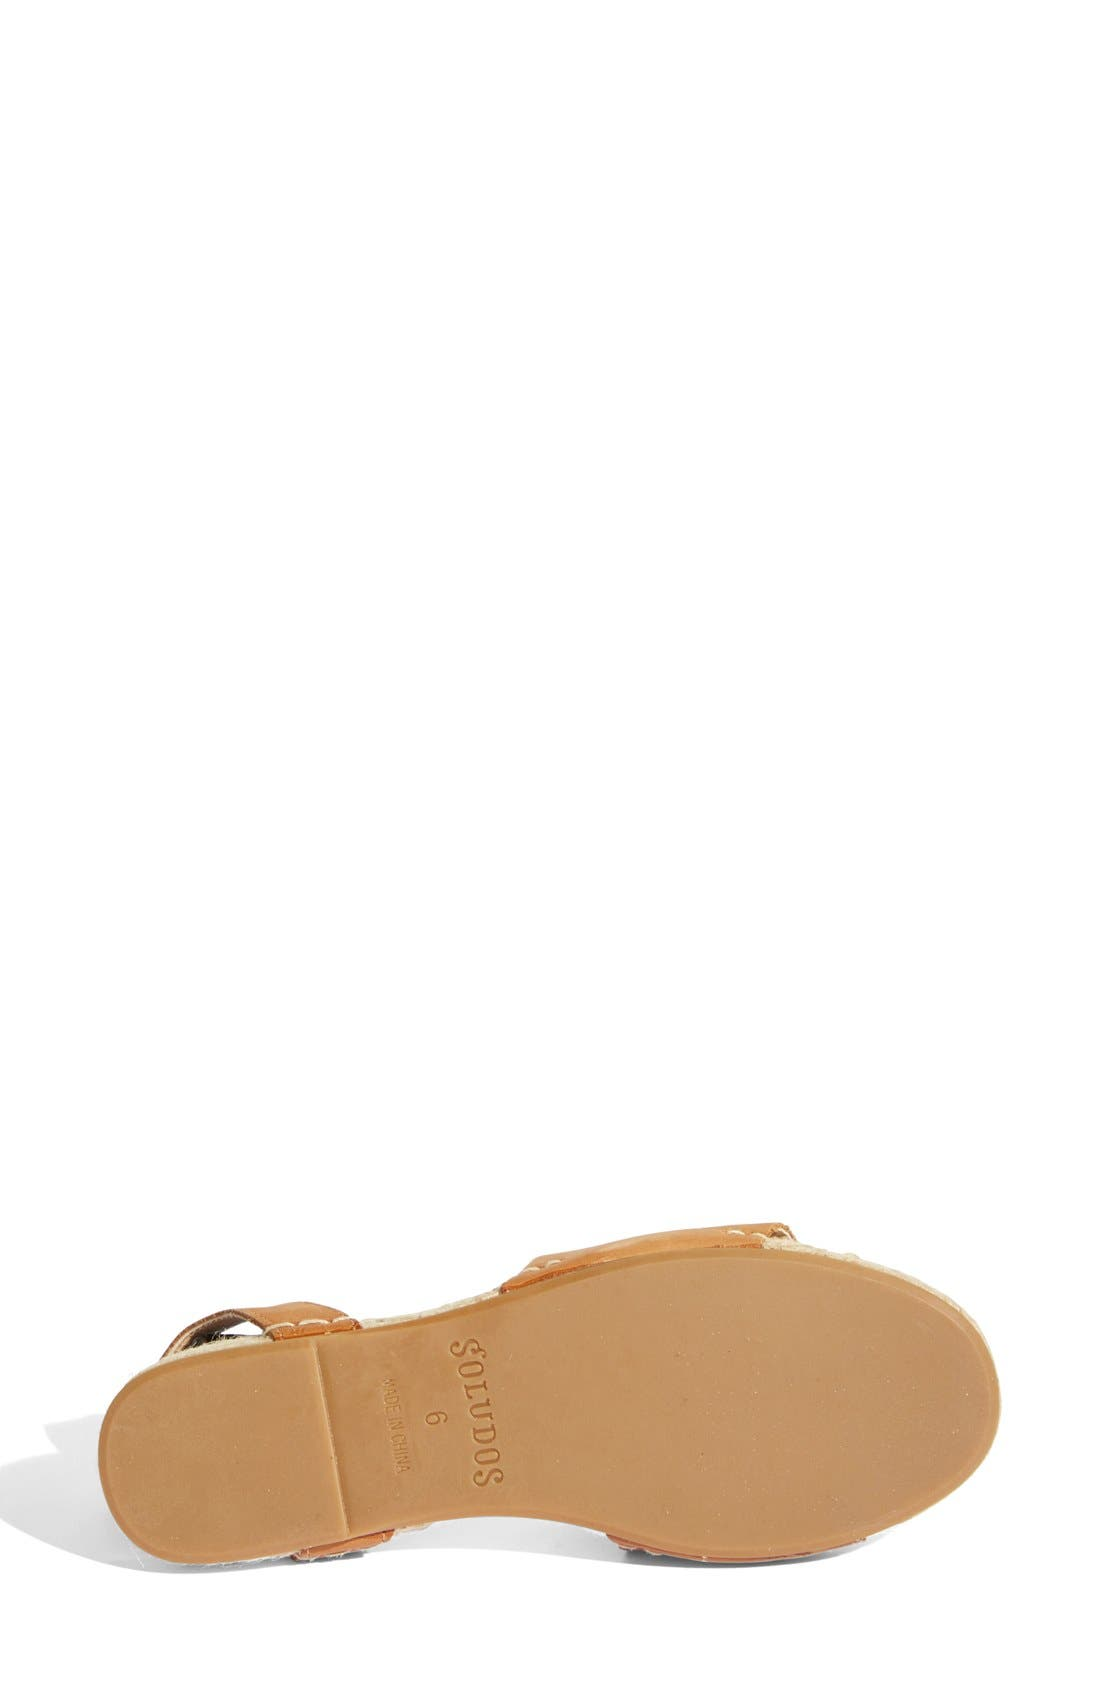 Slingback Sandal,                             Alternate thumbnail 3, color,                             211